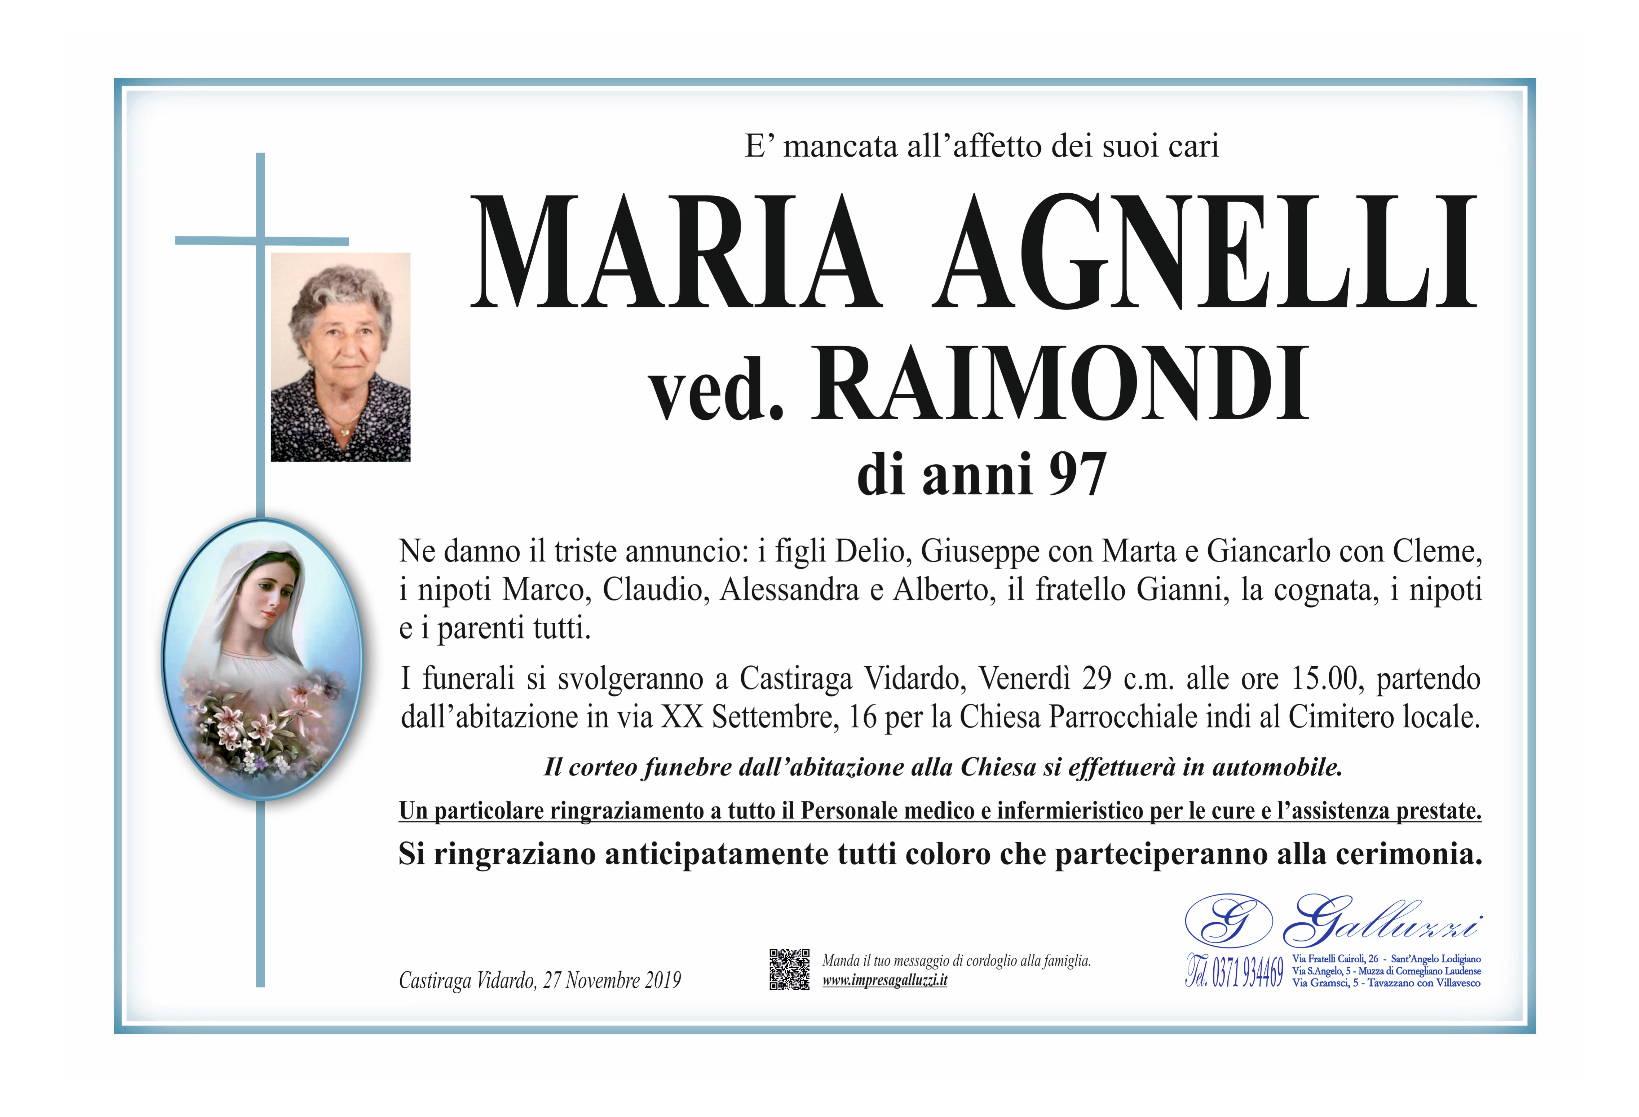 Maria Agnelli